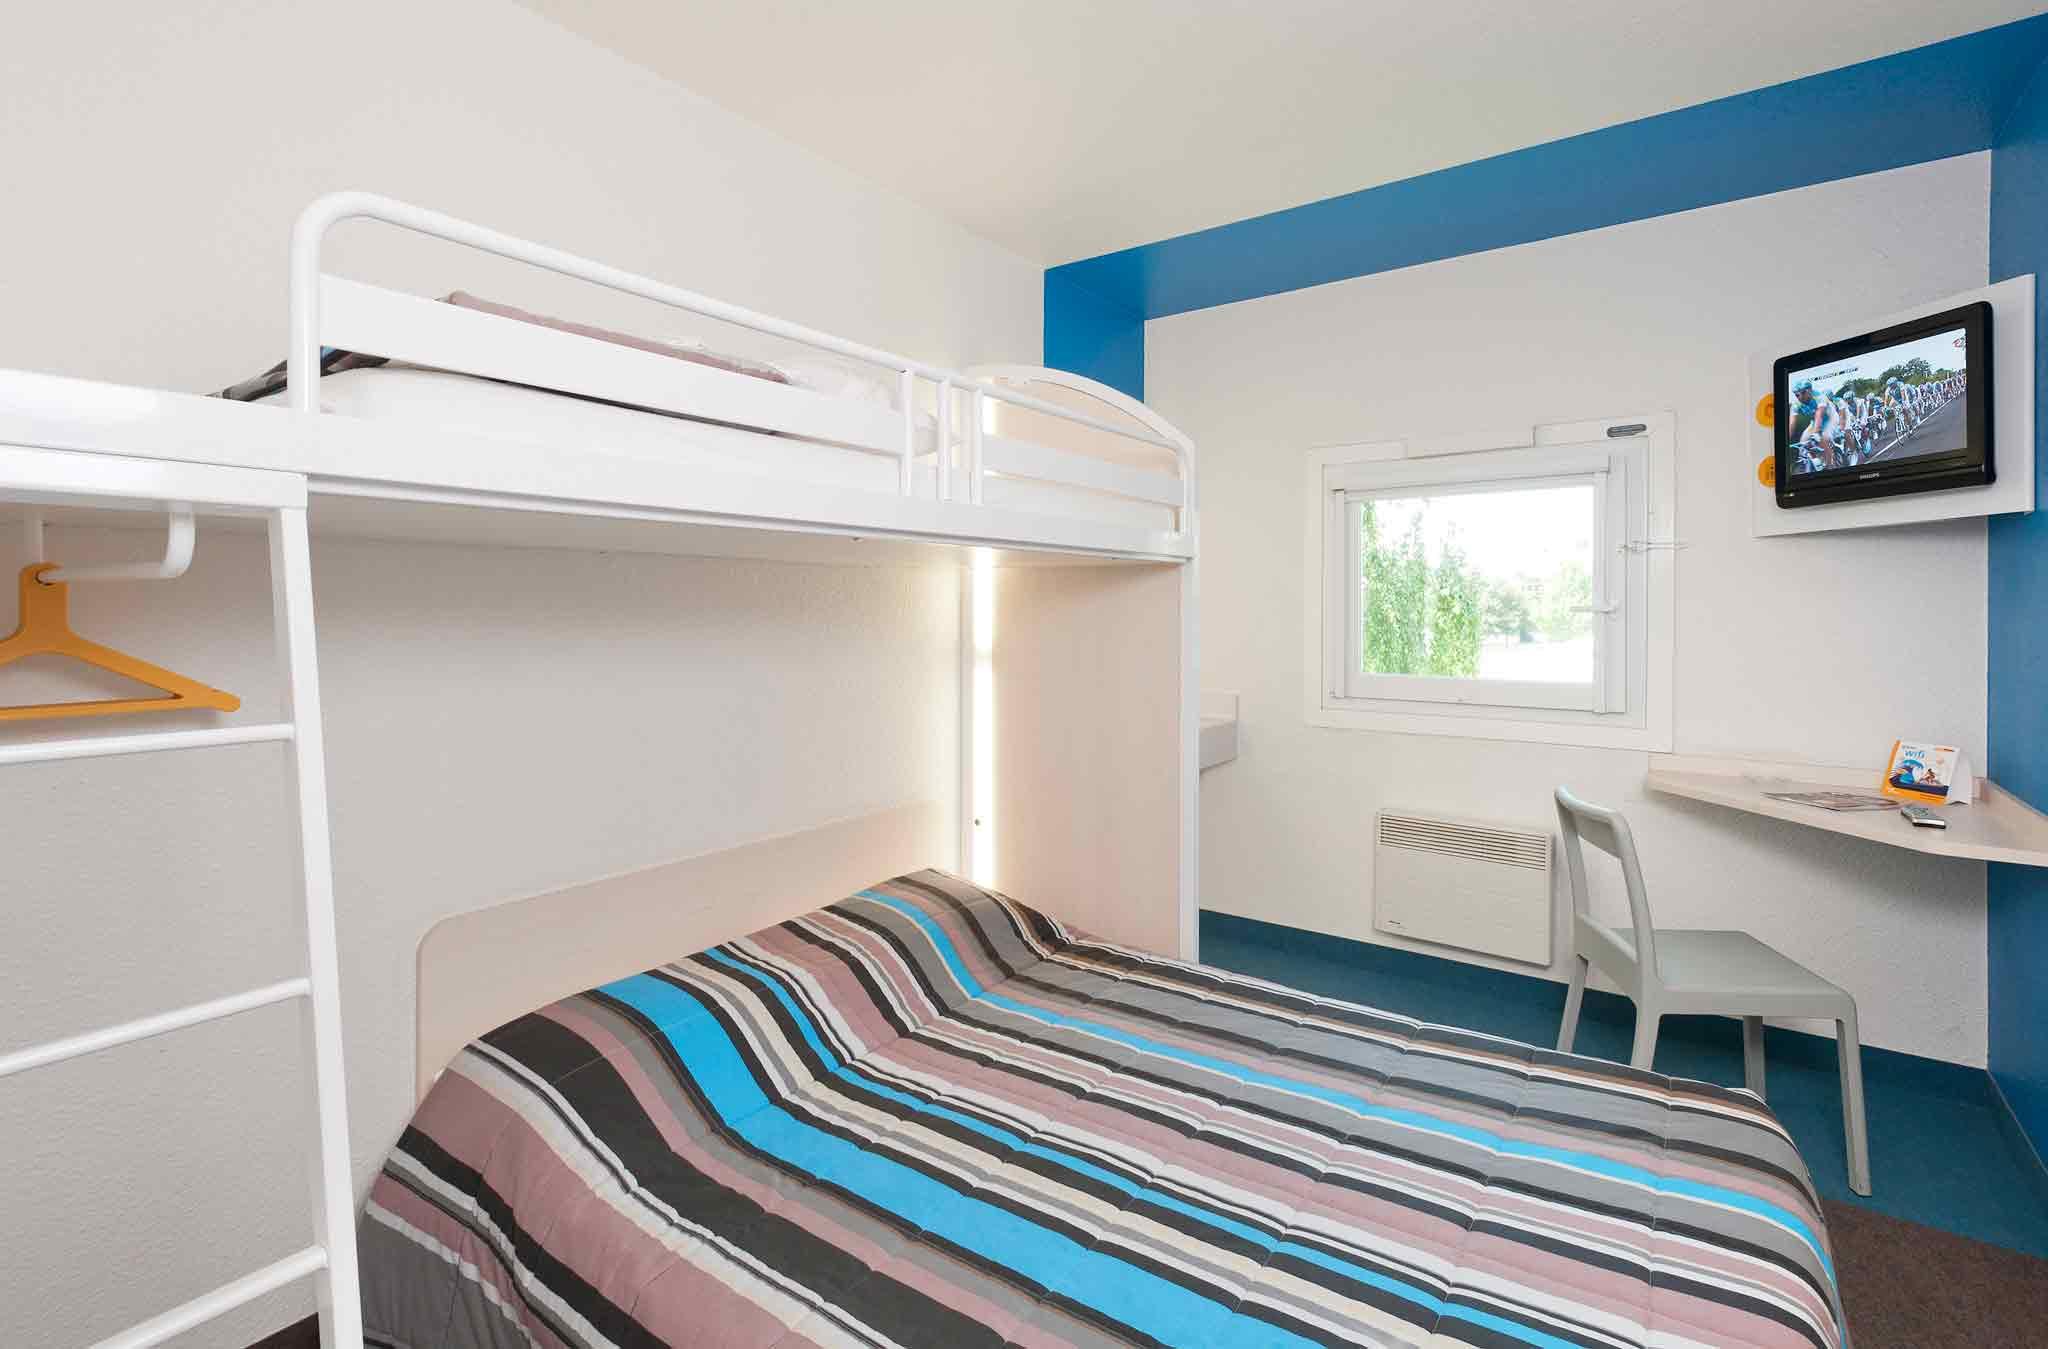 Hôtel - hotelF1 Vitry N7